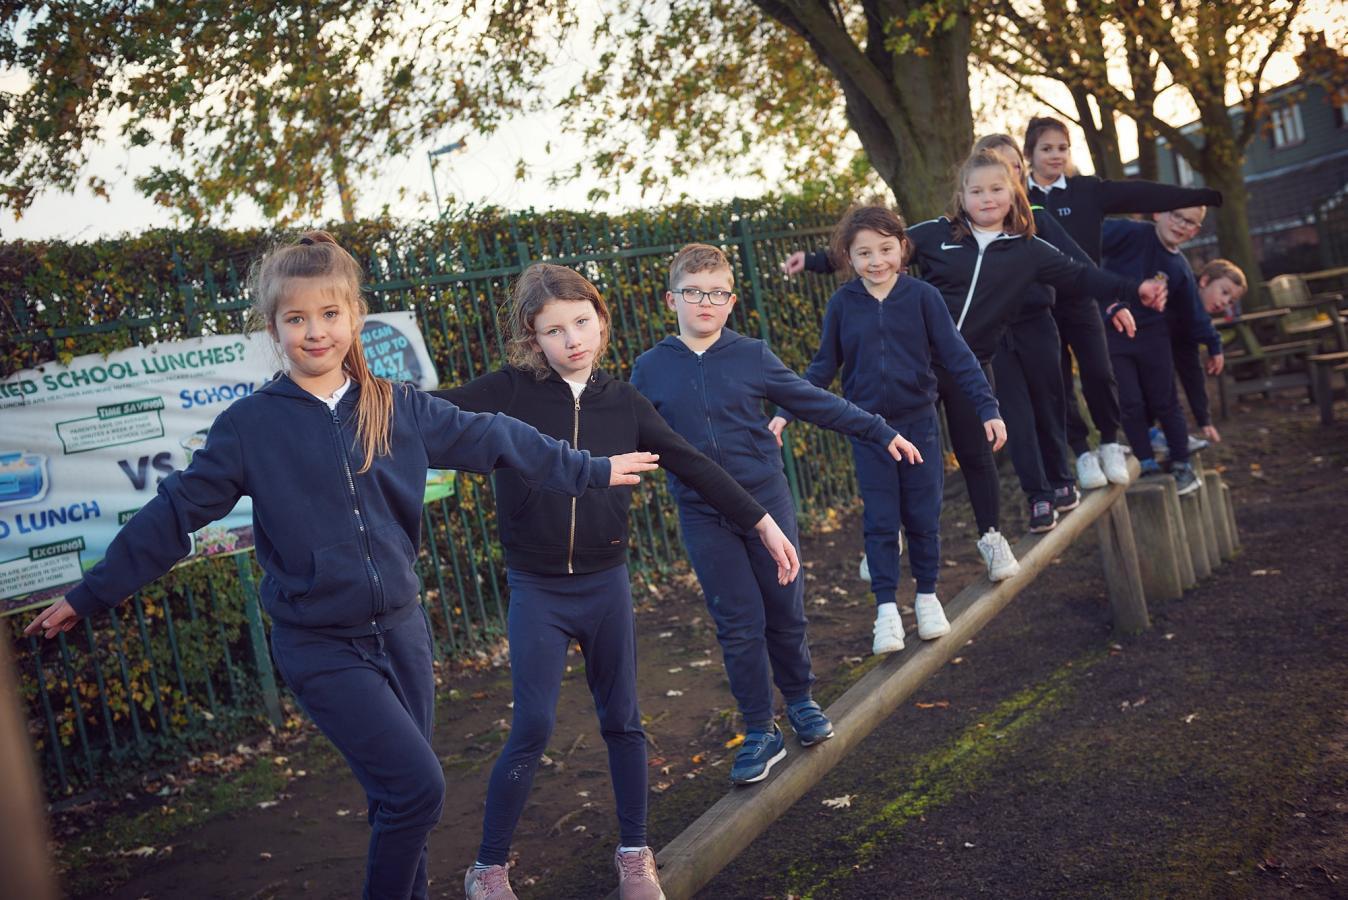 Towngate pupils balancing